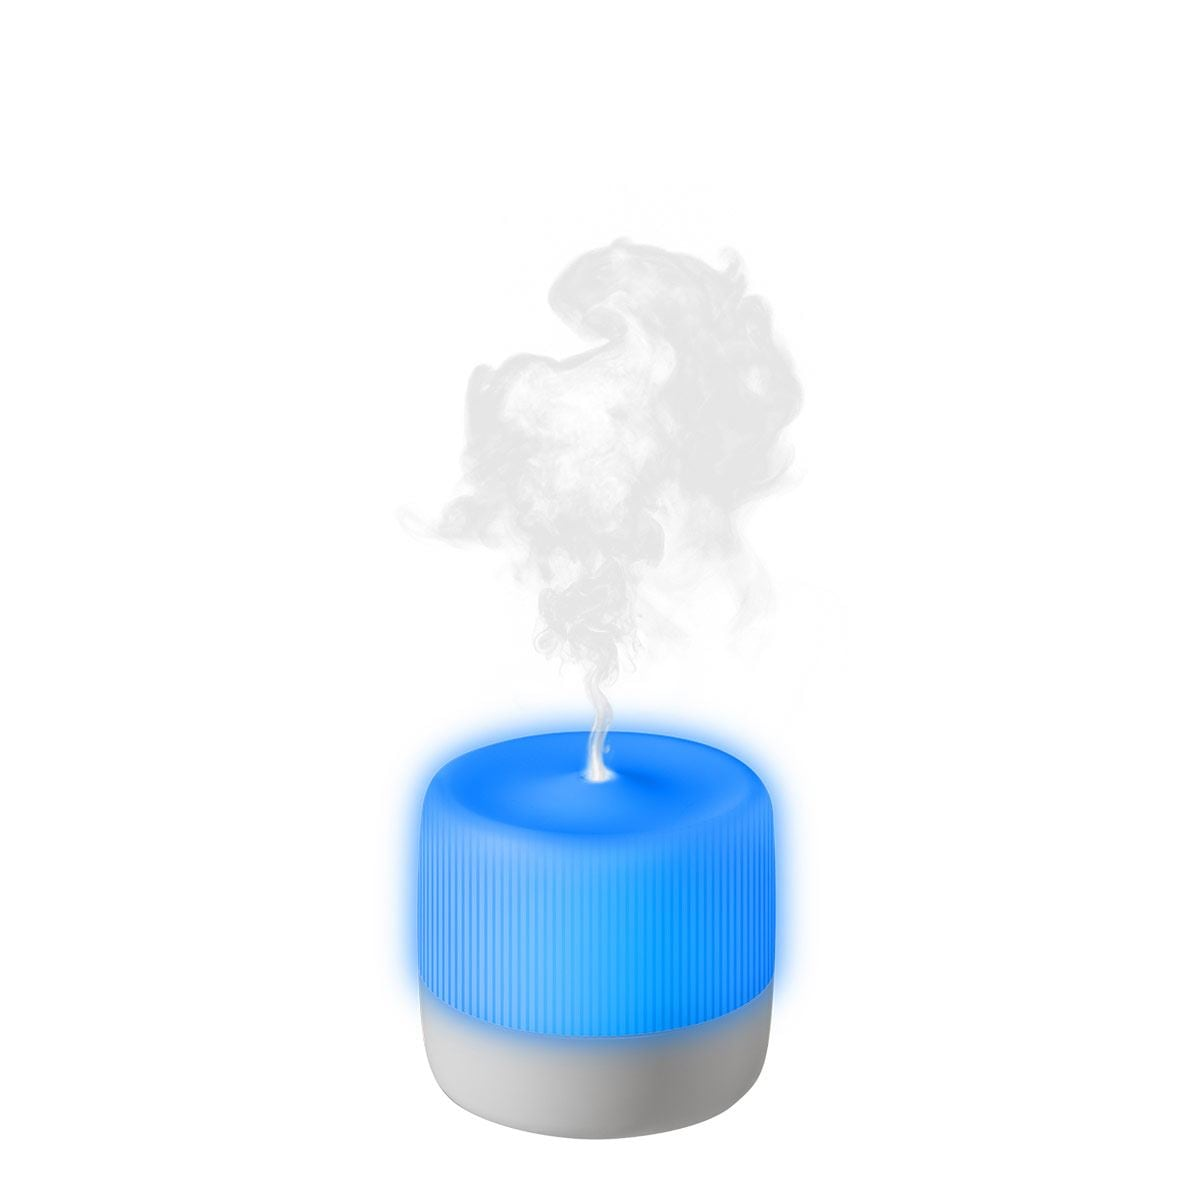 Difusor de Aroma Ultrasónico Homedics